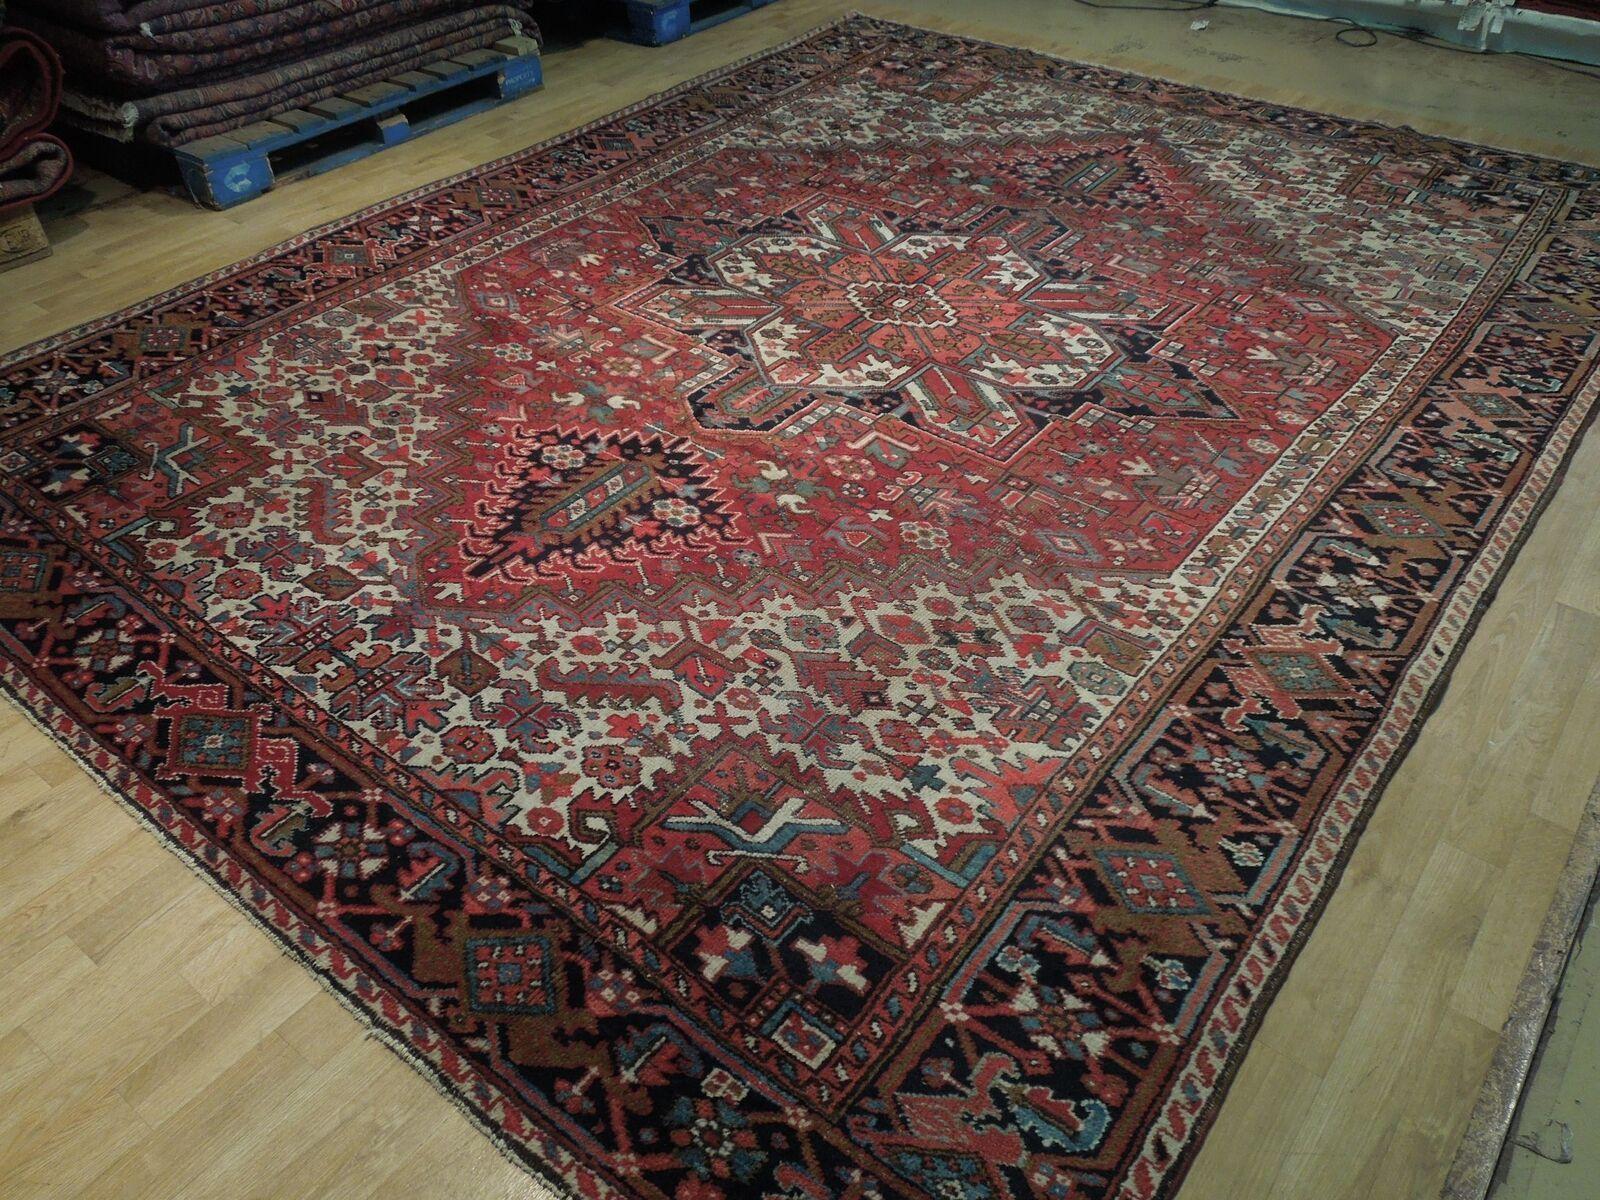 Normal Wear Semi-Antique Persian Handmade 9x12 Burgundy Heriz Wool Rug image 5